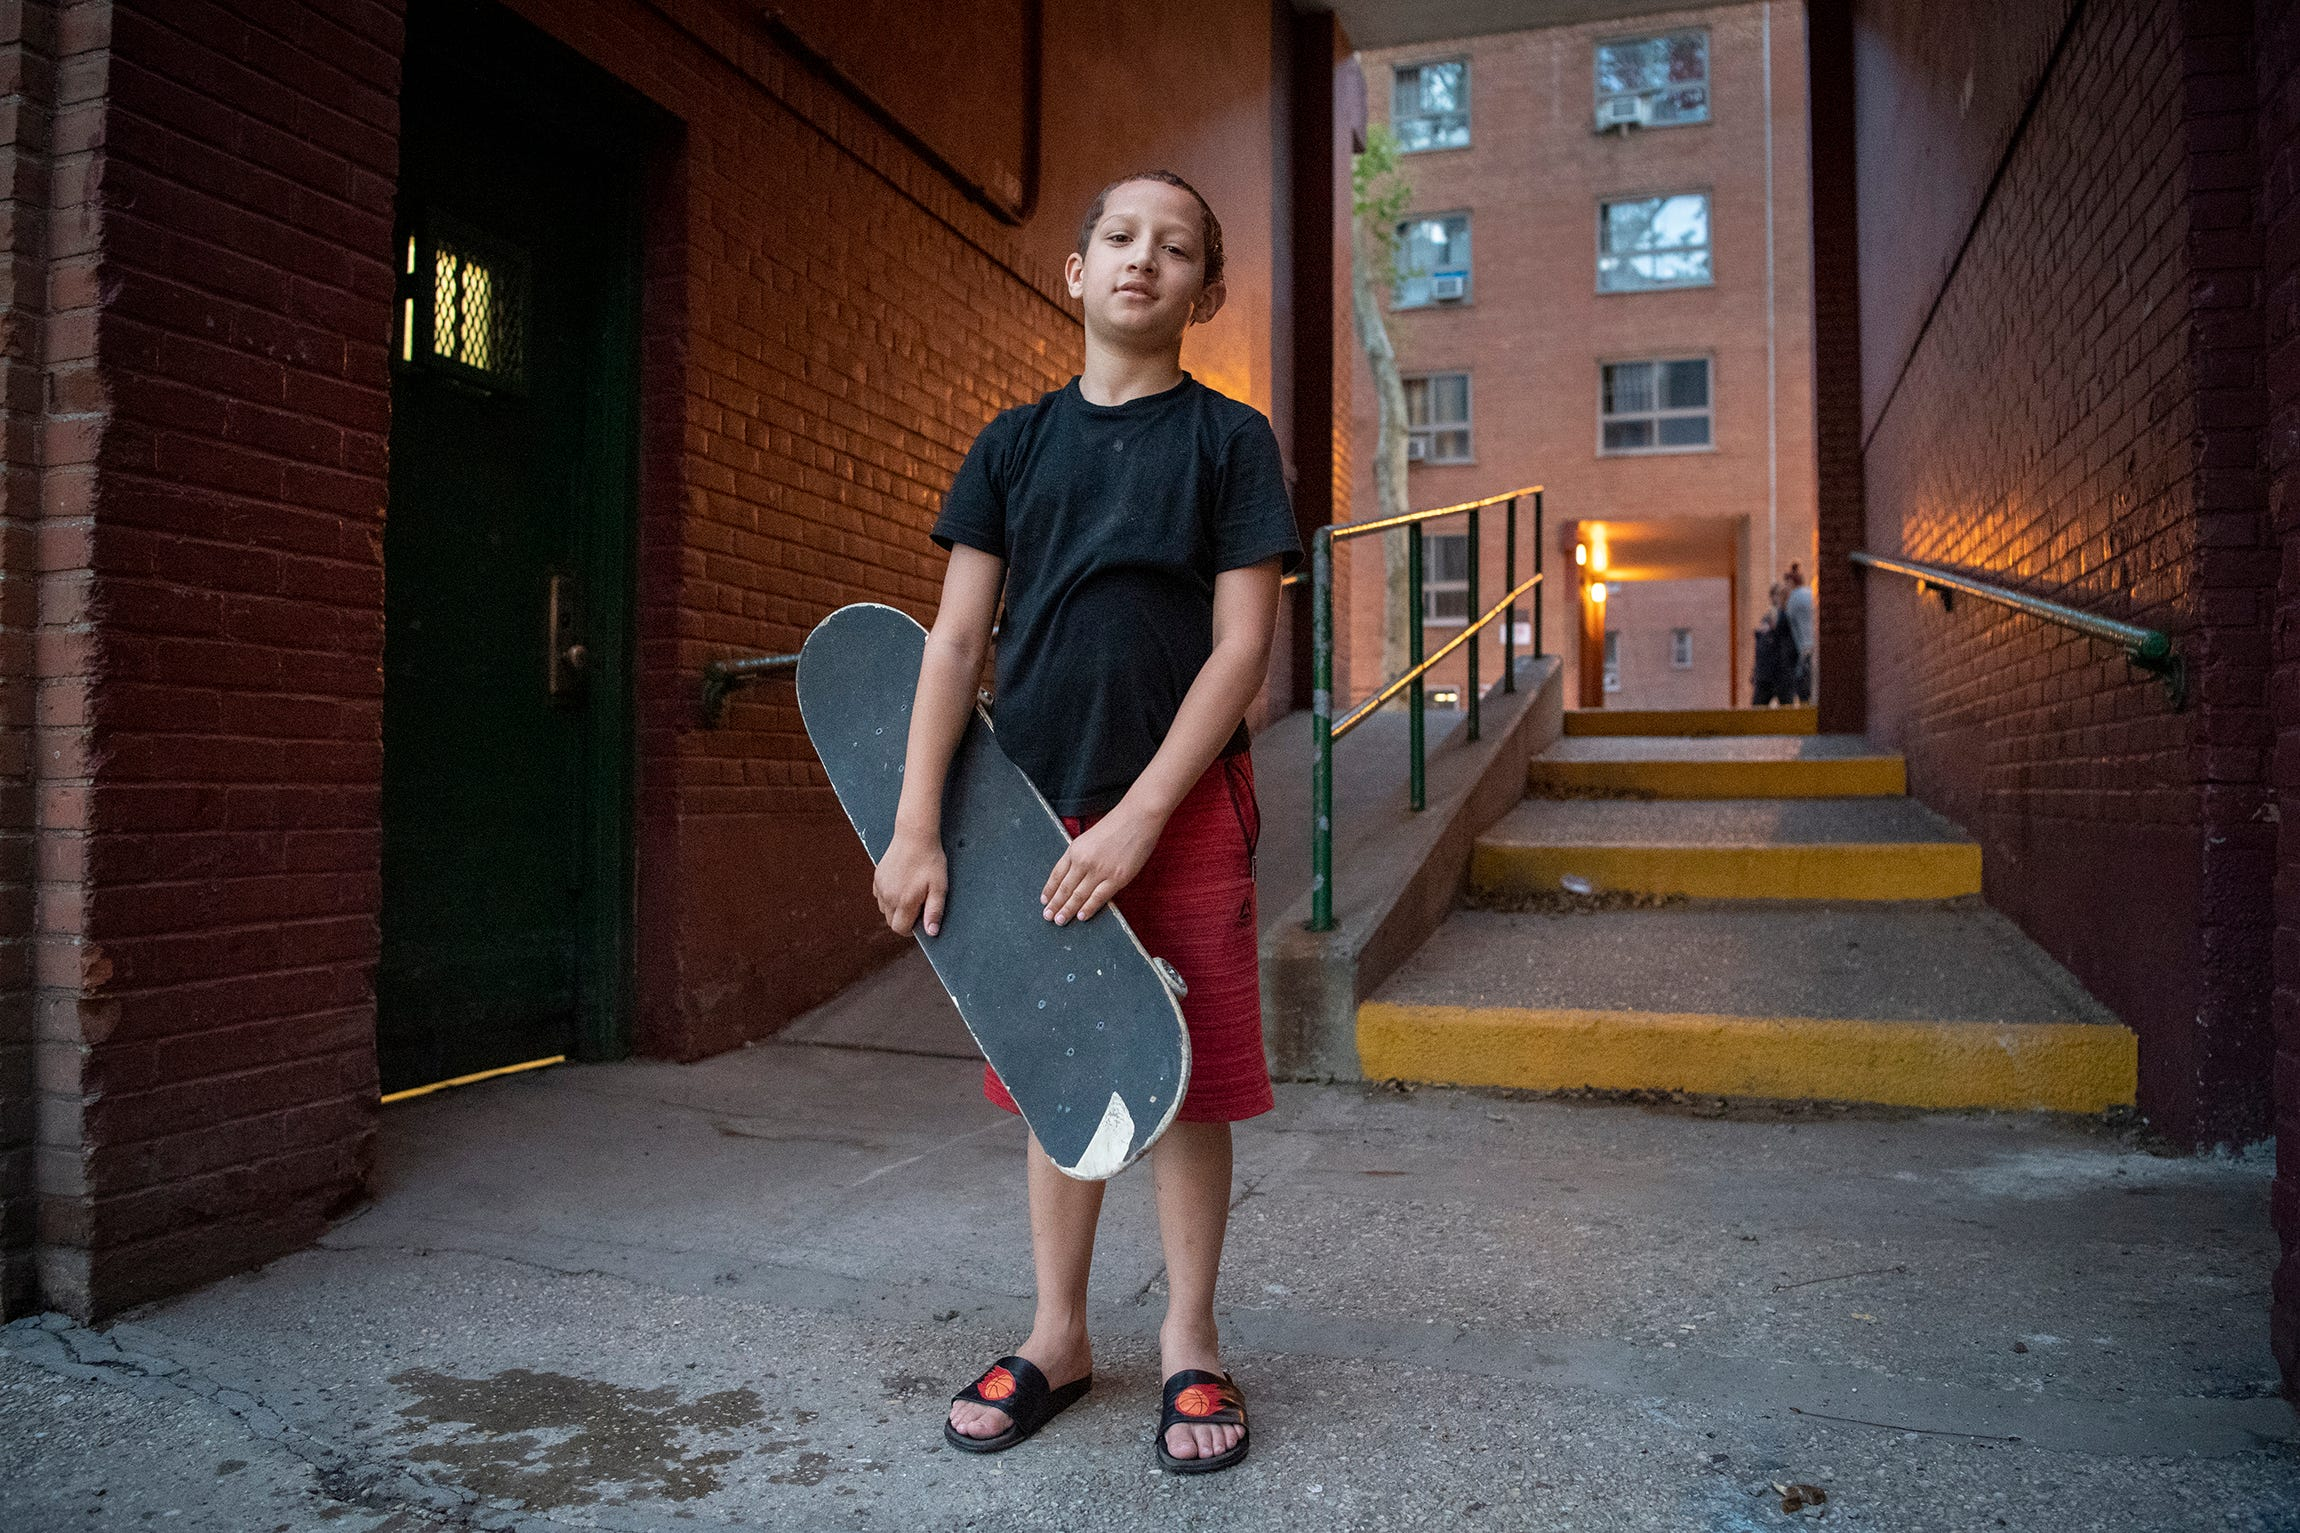 Landon Rodriguez outside the apartment building where he lives.